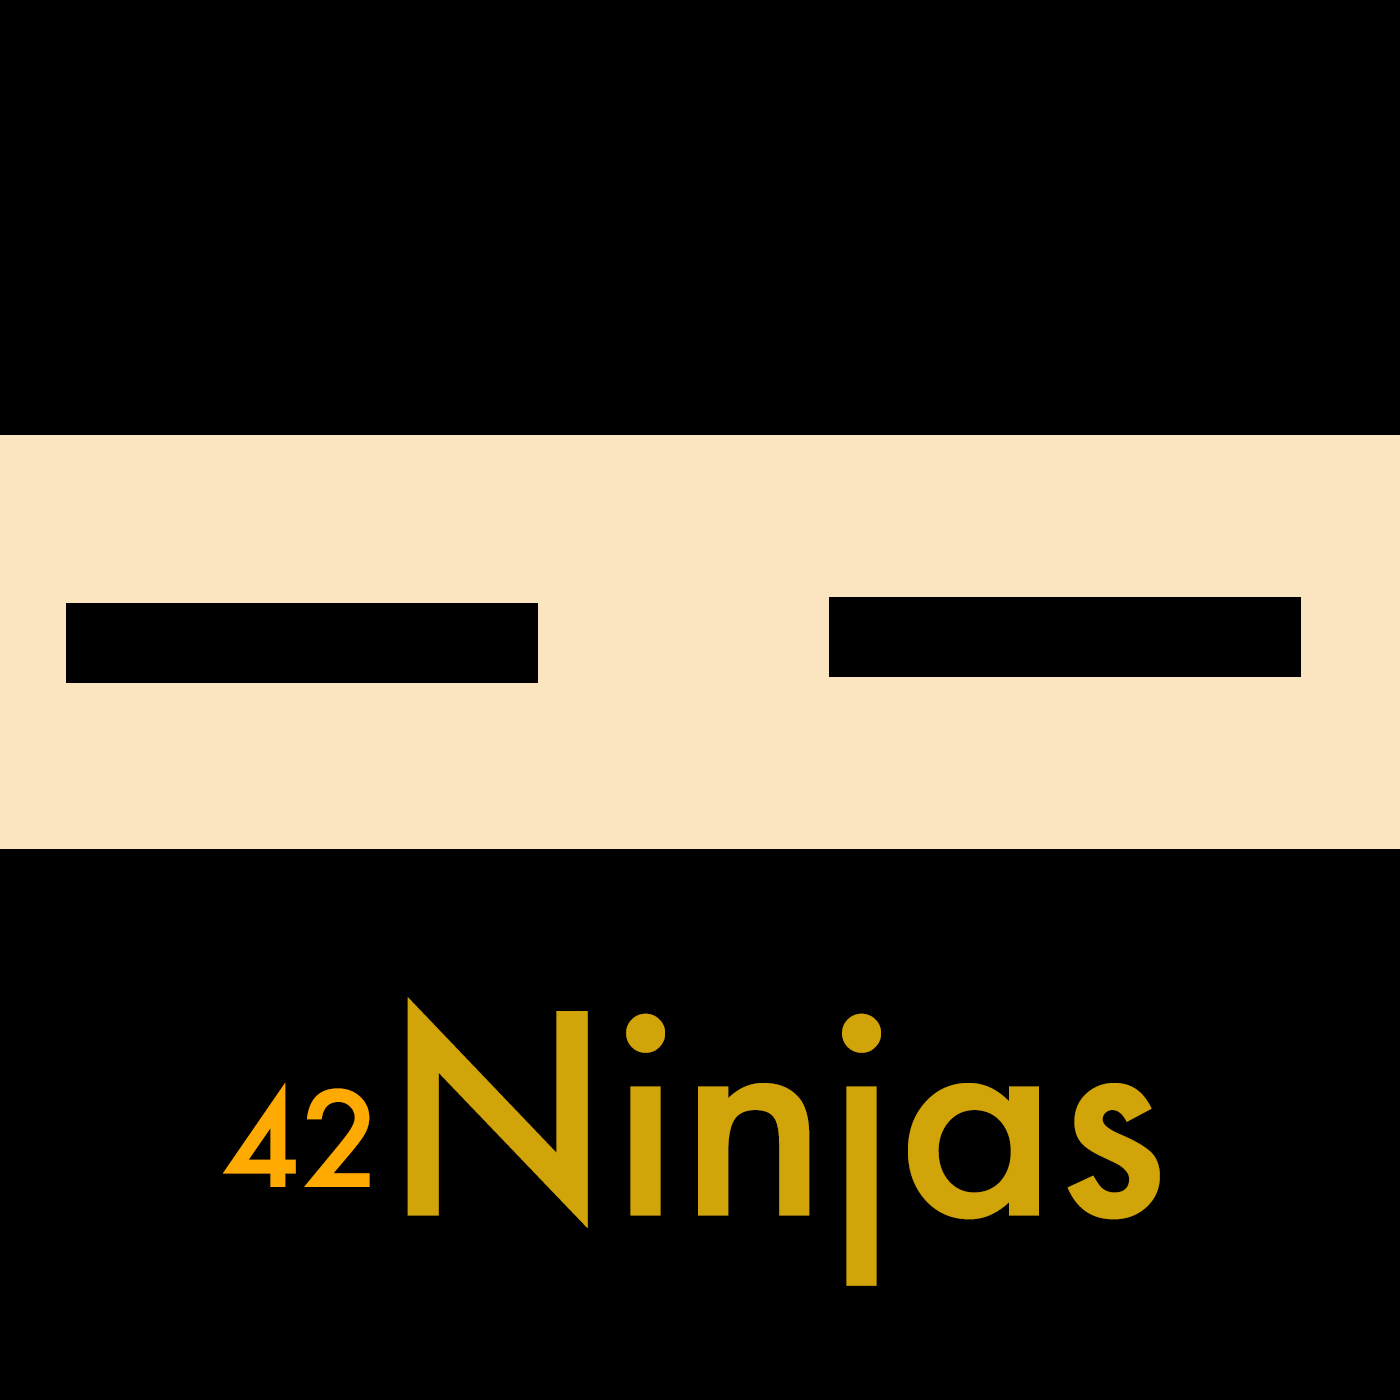 42 Ninjas